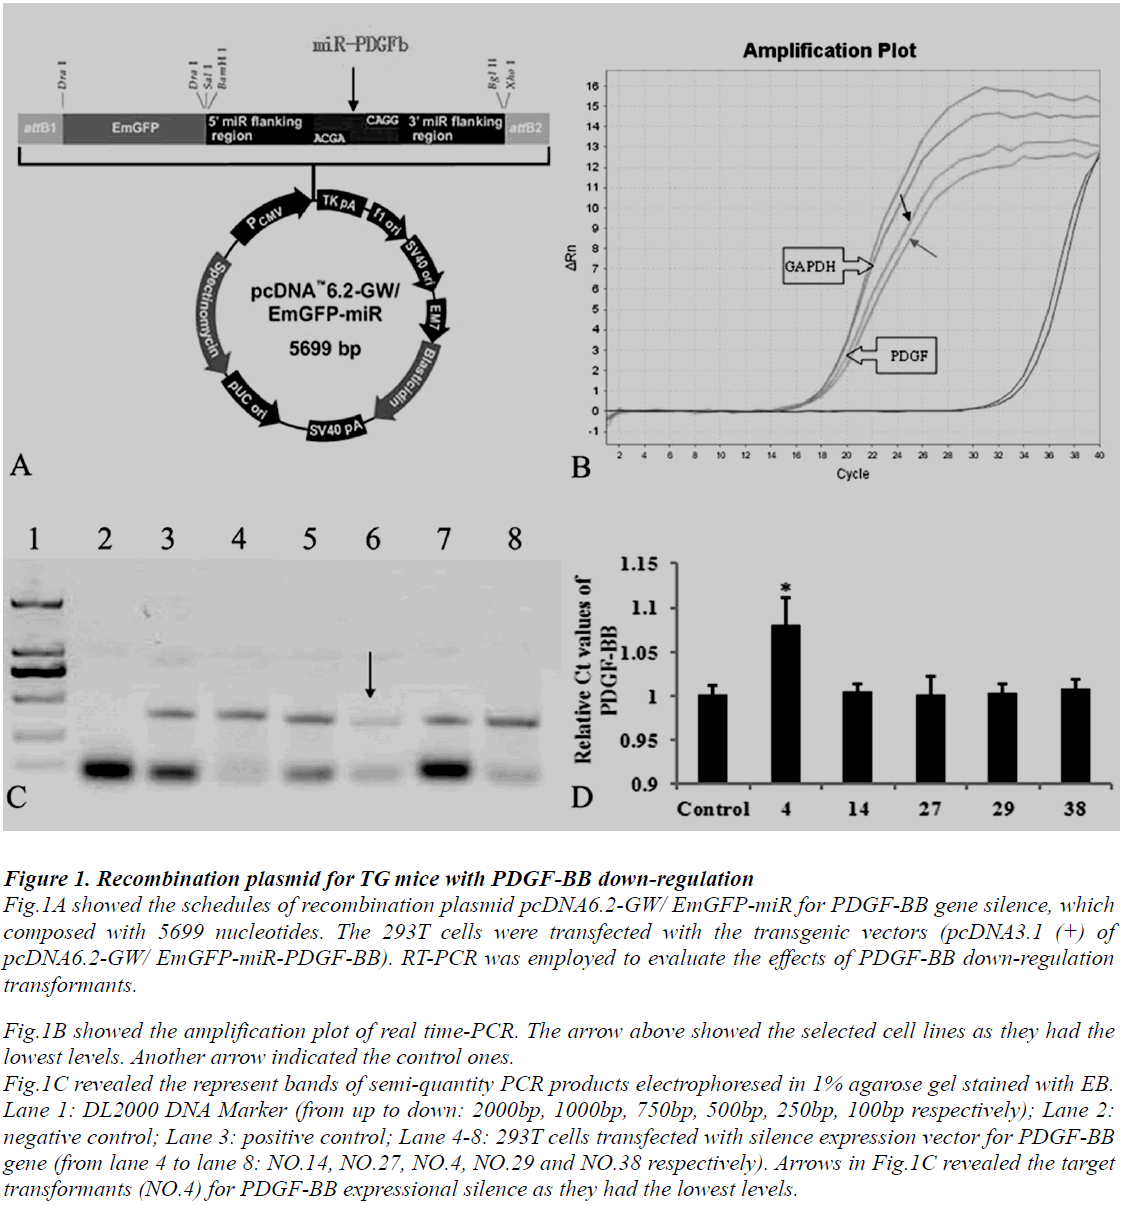 biomedres-recombination-plasmid